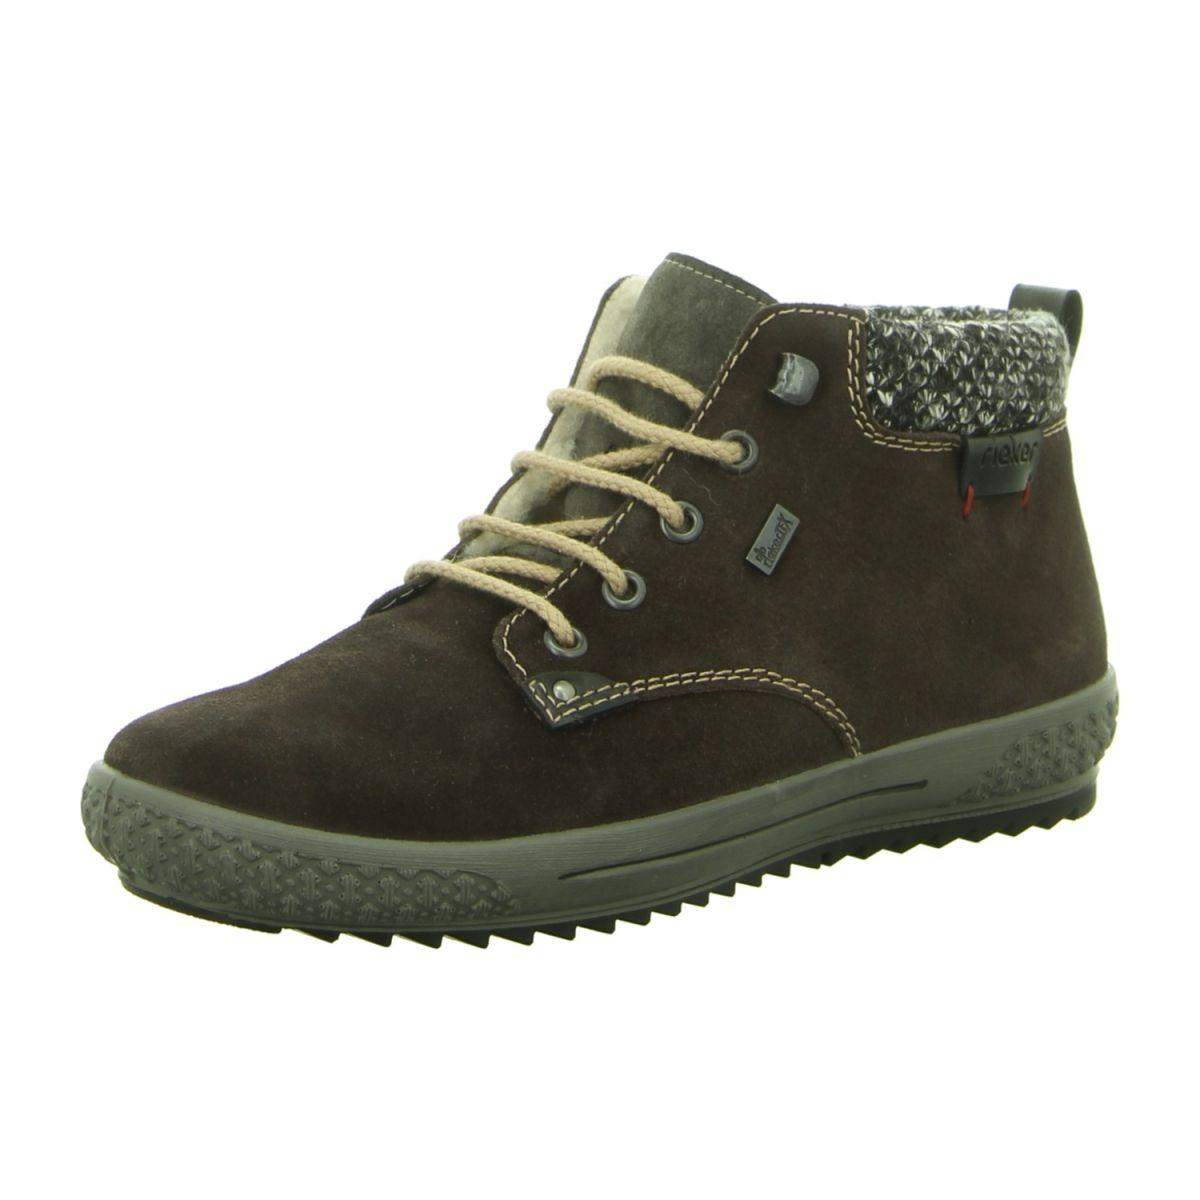 Rieker Damenschuhe Stiefel Stiefeletten Boots M6140 45 Grau